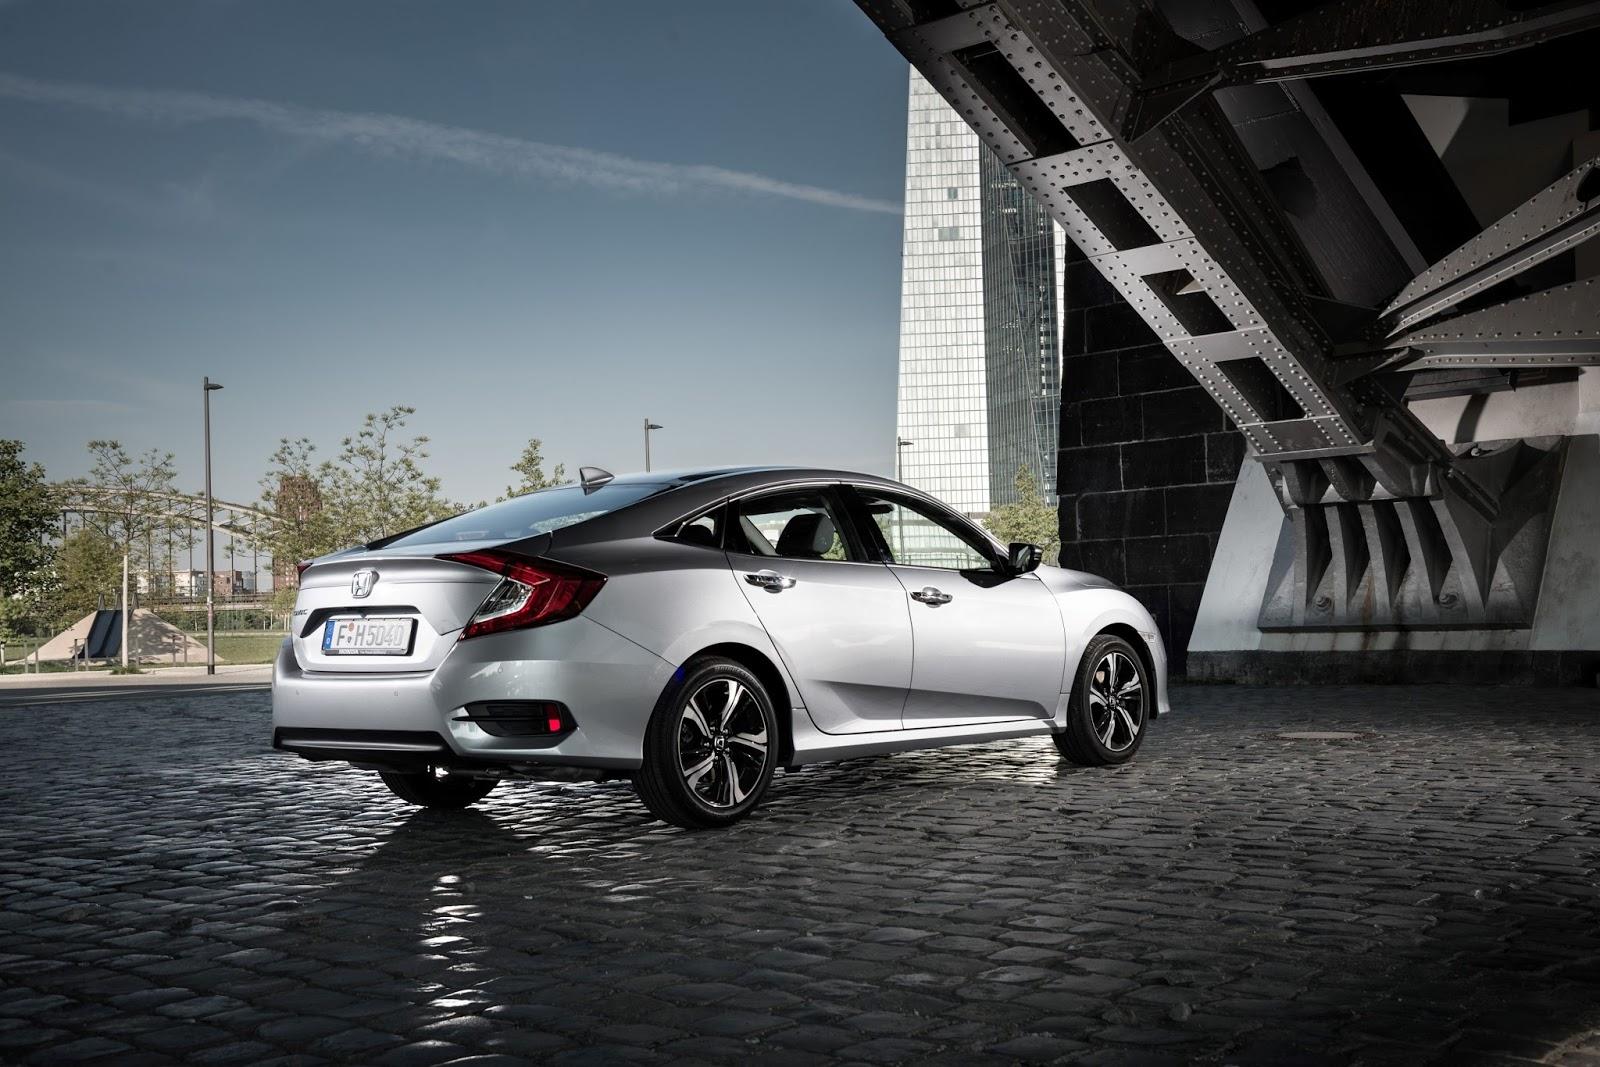 Honda Civic Sedan Οι τεχνολογίες που ενσωματώνει η 10η γενιά του Civic Sedan